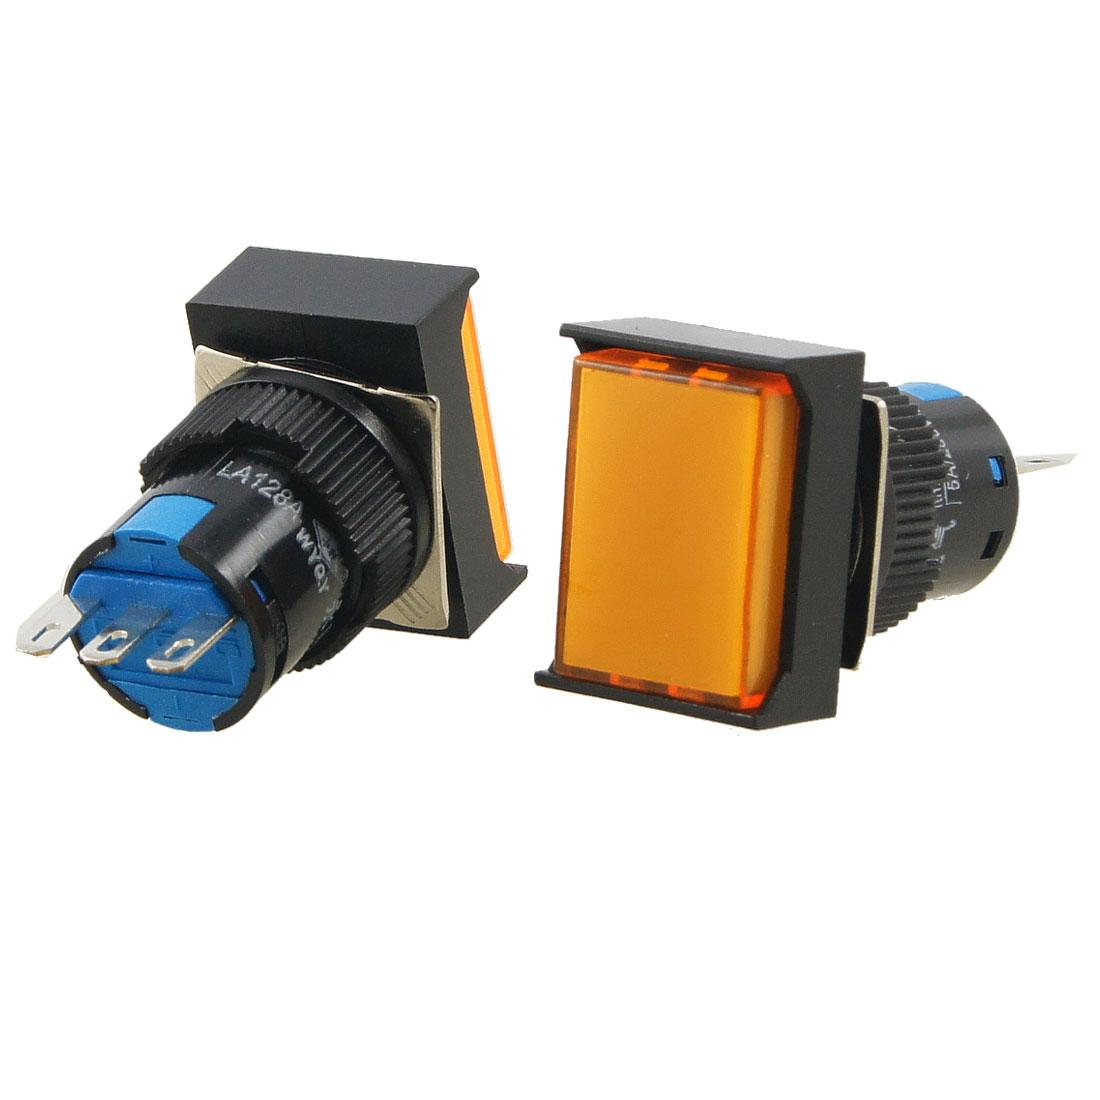 AC 250V 5A Orange 1NO 1NC Rectangle Momentary 16mm Push Button Switch 2 Pcs